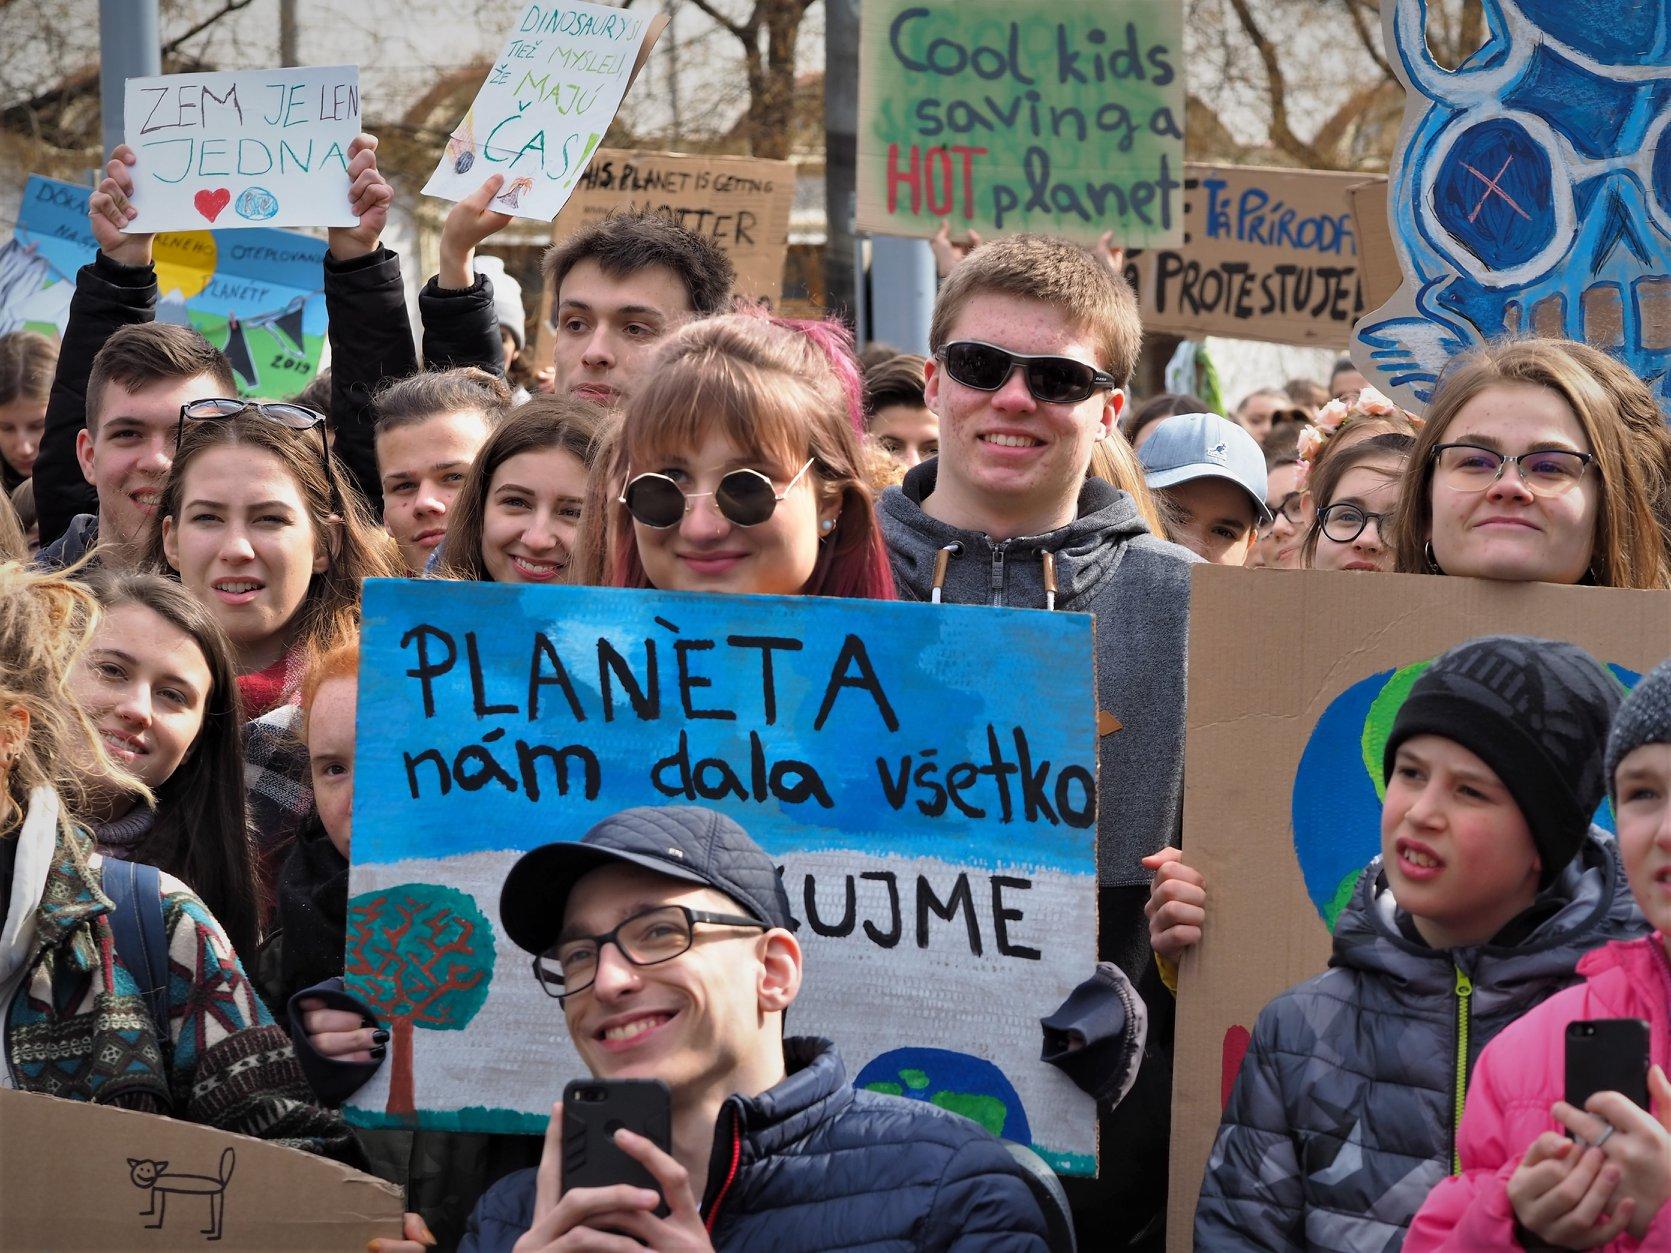 AUDIO: V piatok deti nešli do školy, štrajkovali proti zmene klímy